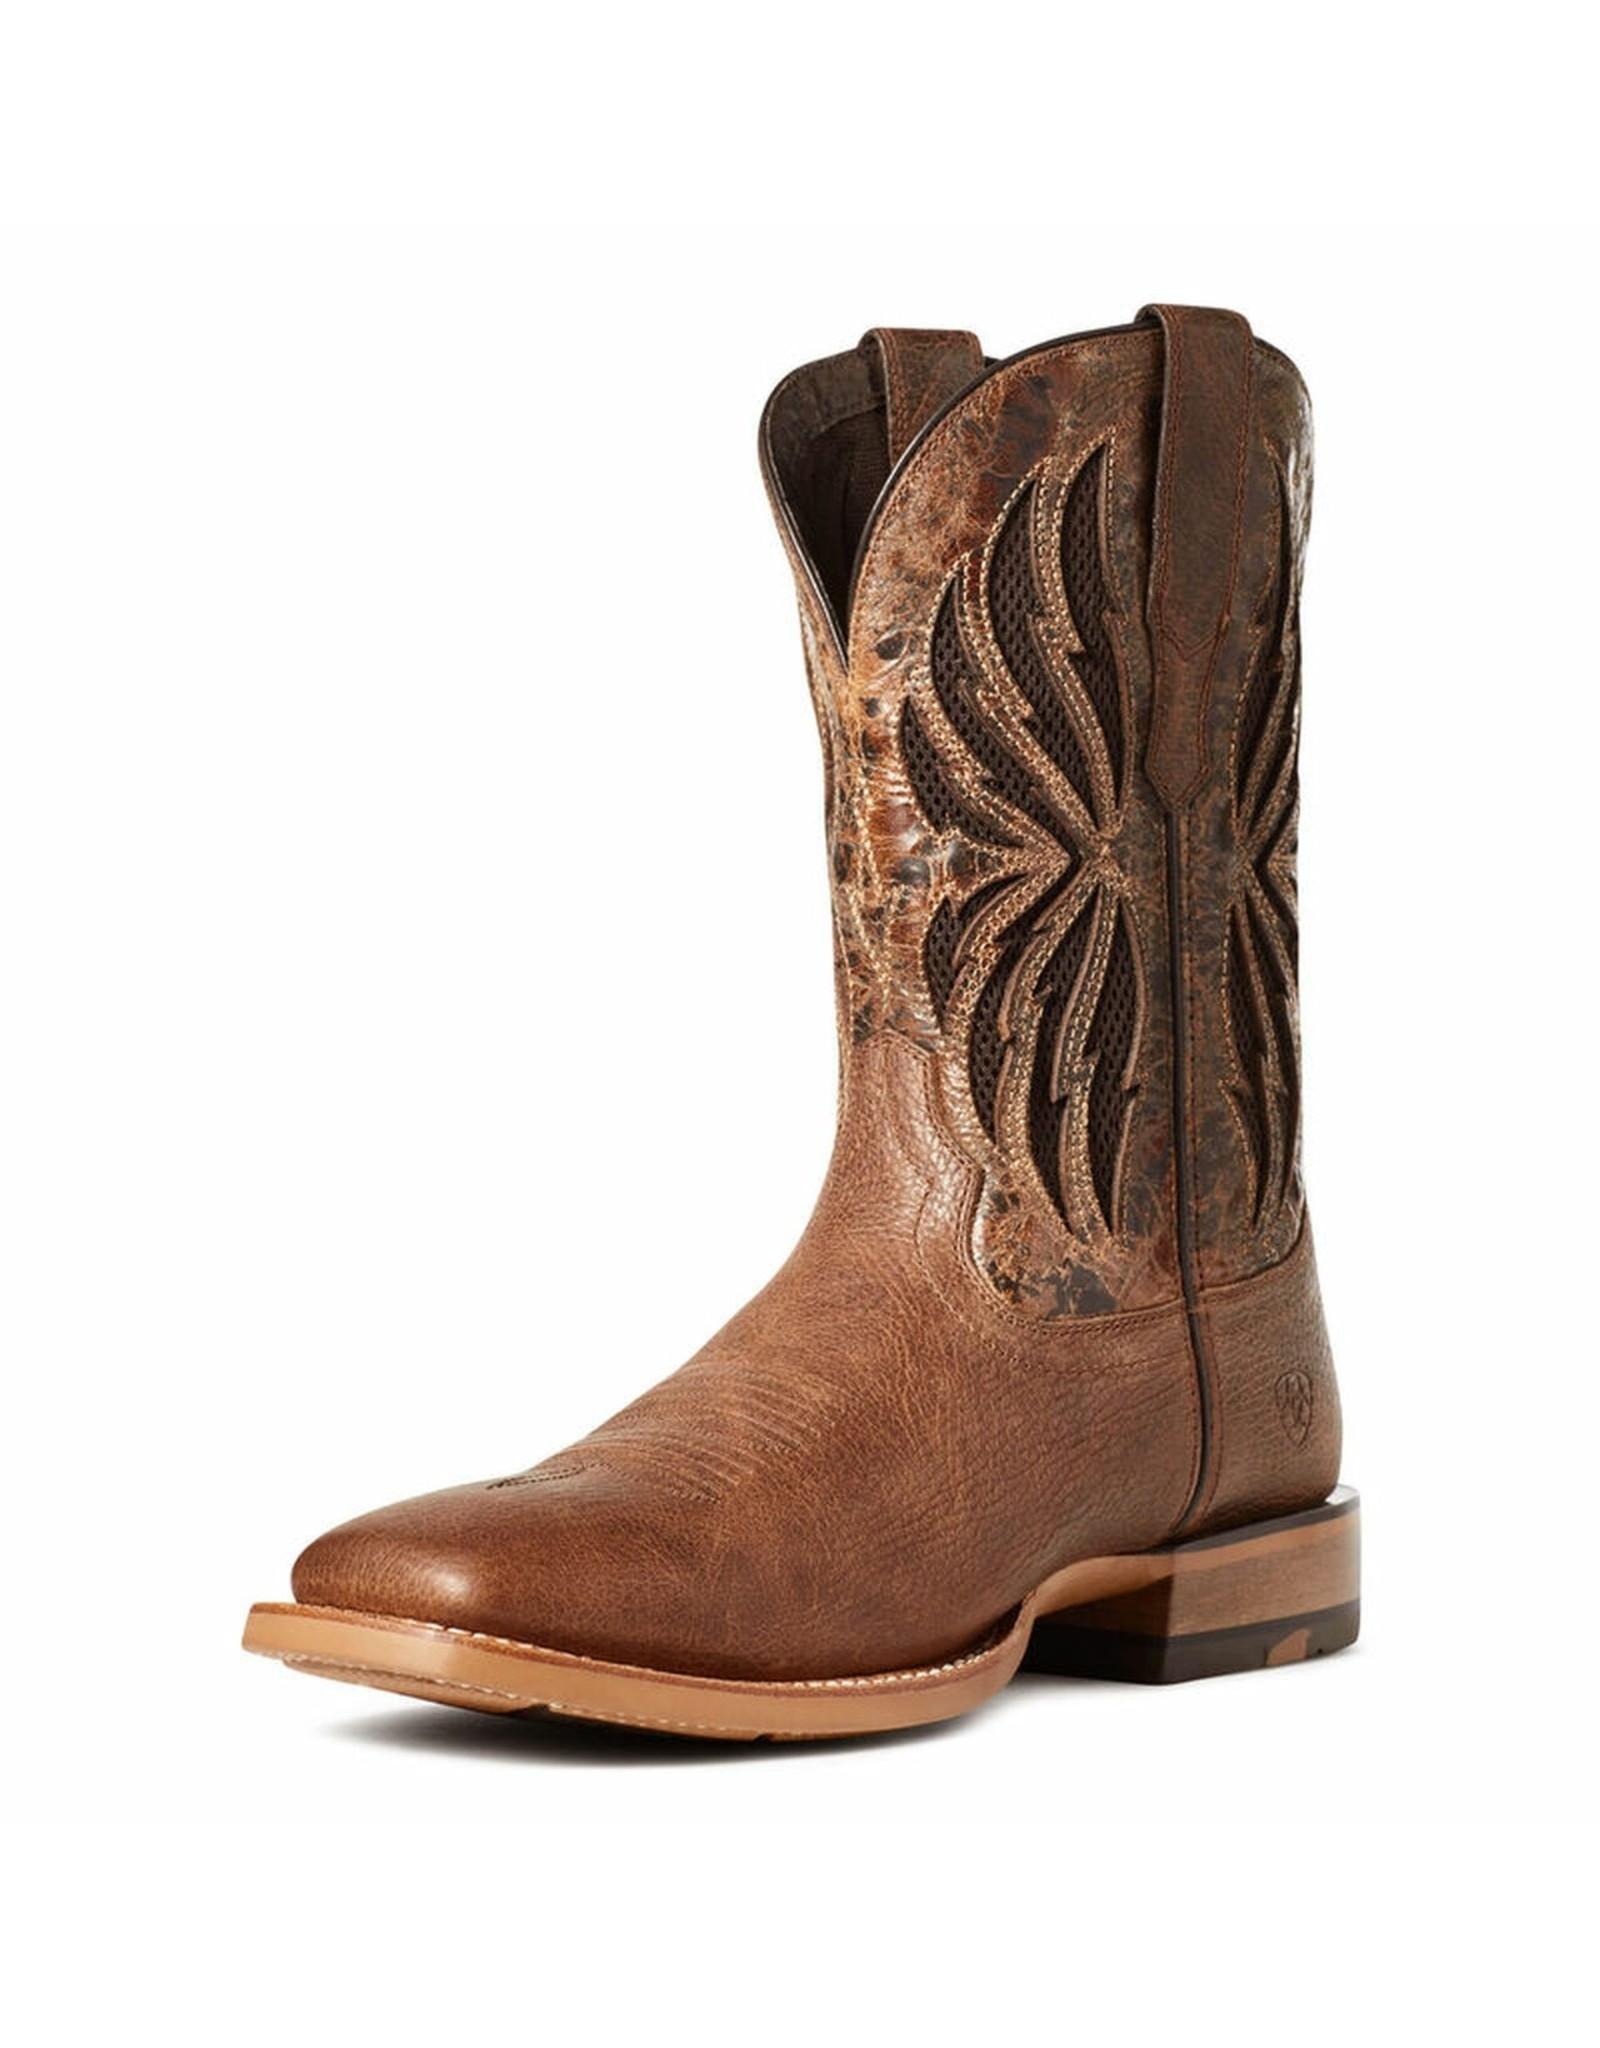 Boots-Men ARIAT 10035950 Arena Record VentTek